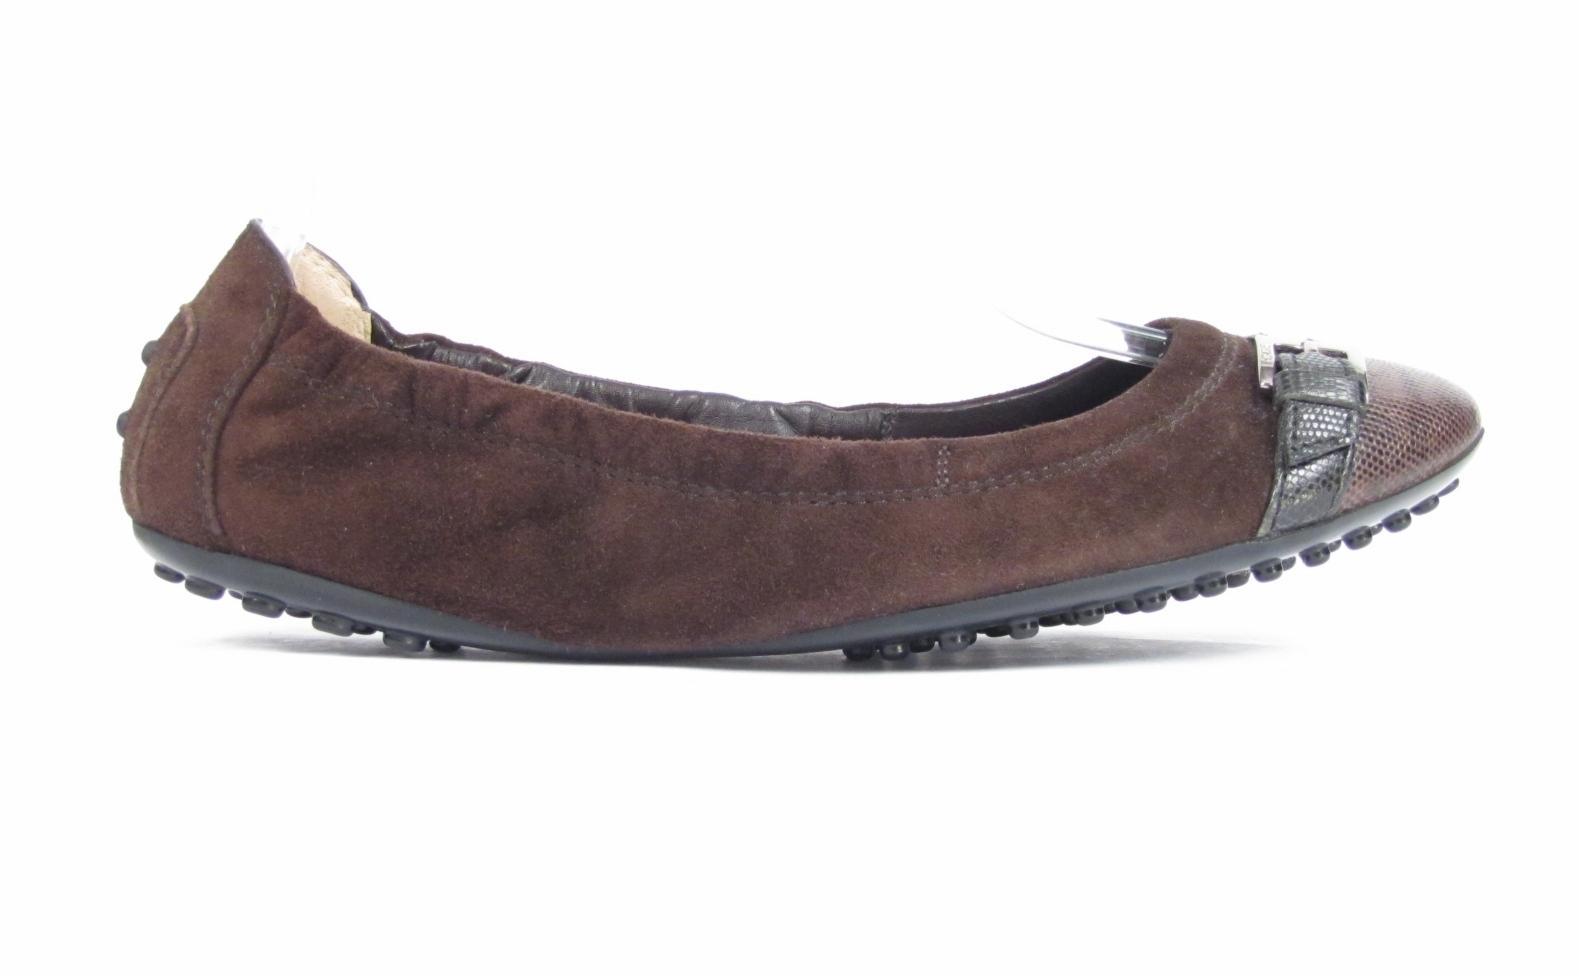 Foldable Flat Shoes Singapore